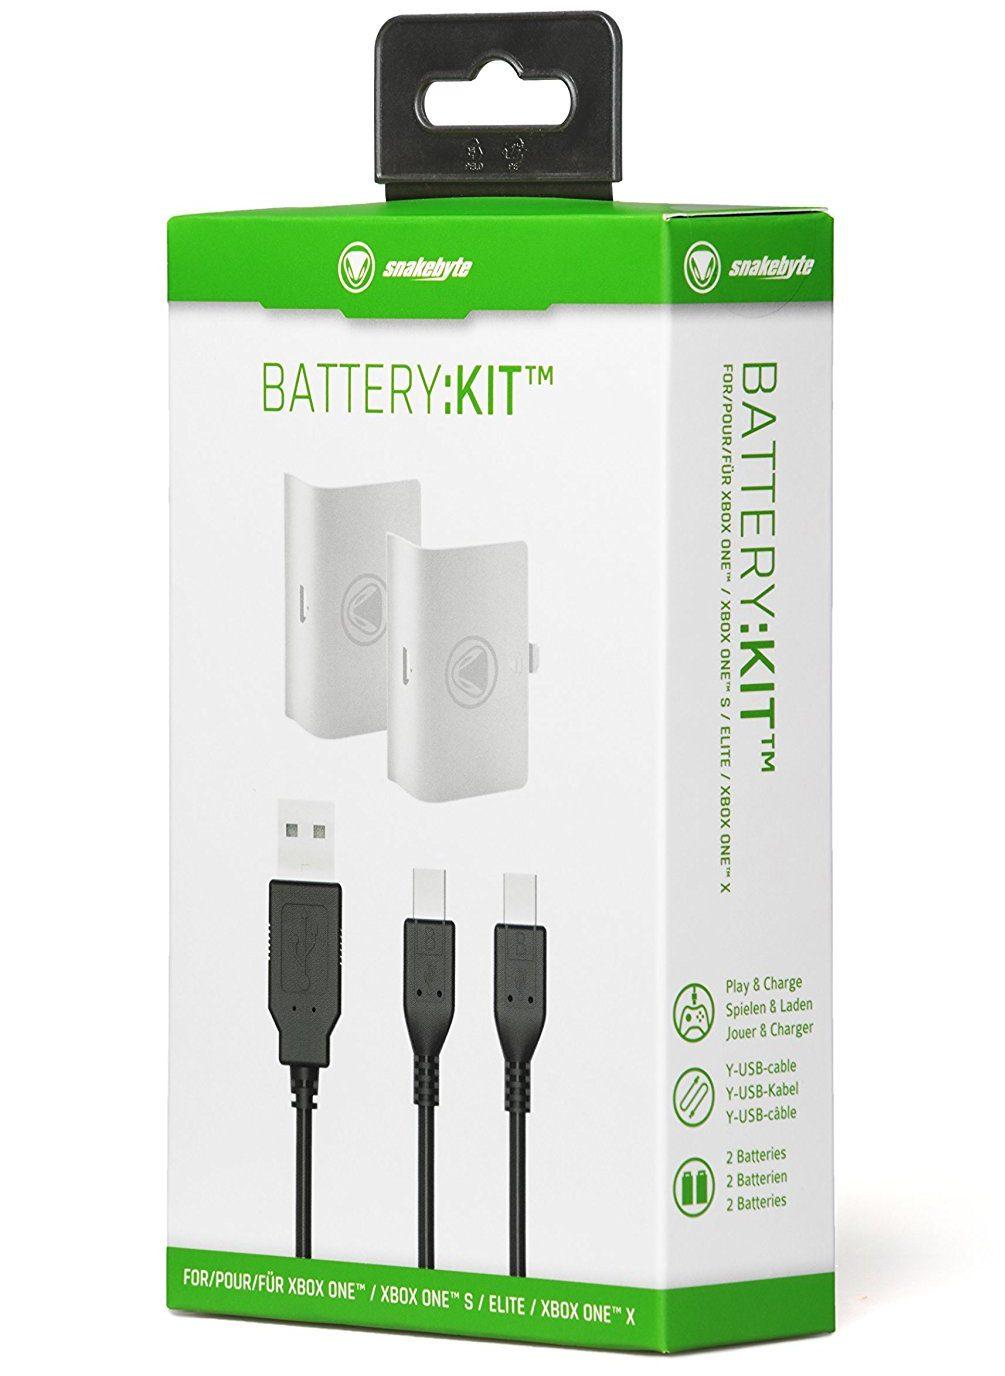 Boxed Snakebyte Xbox One Battery Kit in white